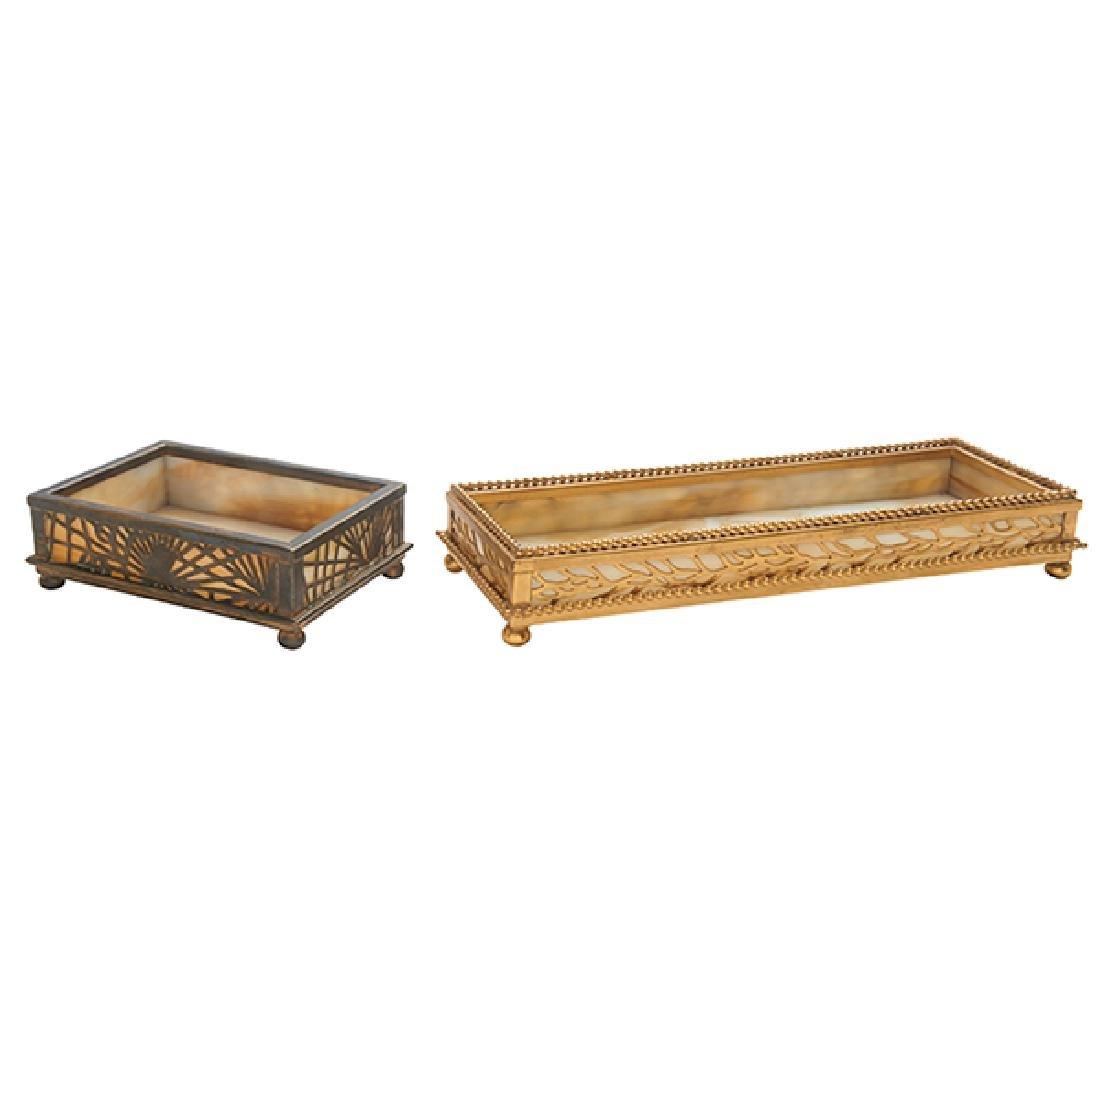 Tiffany Studios Pine Needle desk trays, two, #800 and